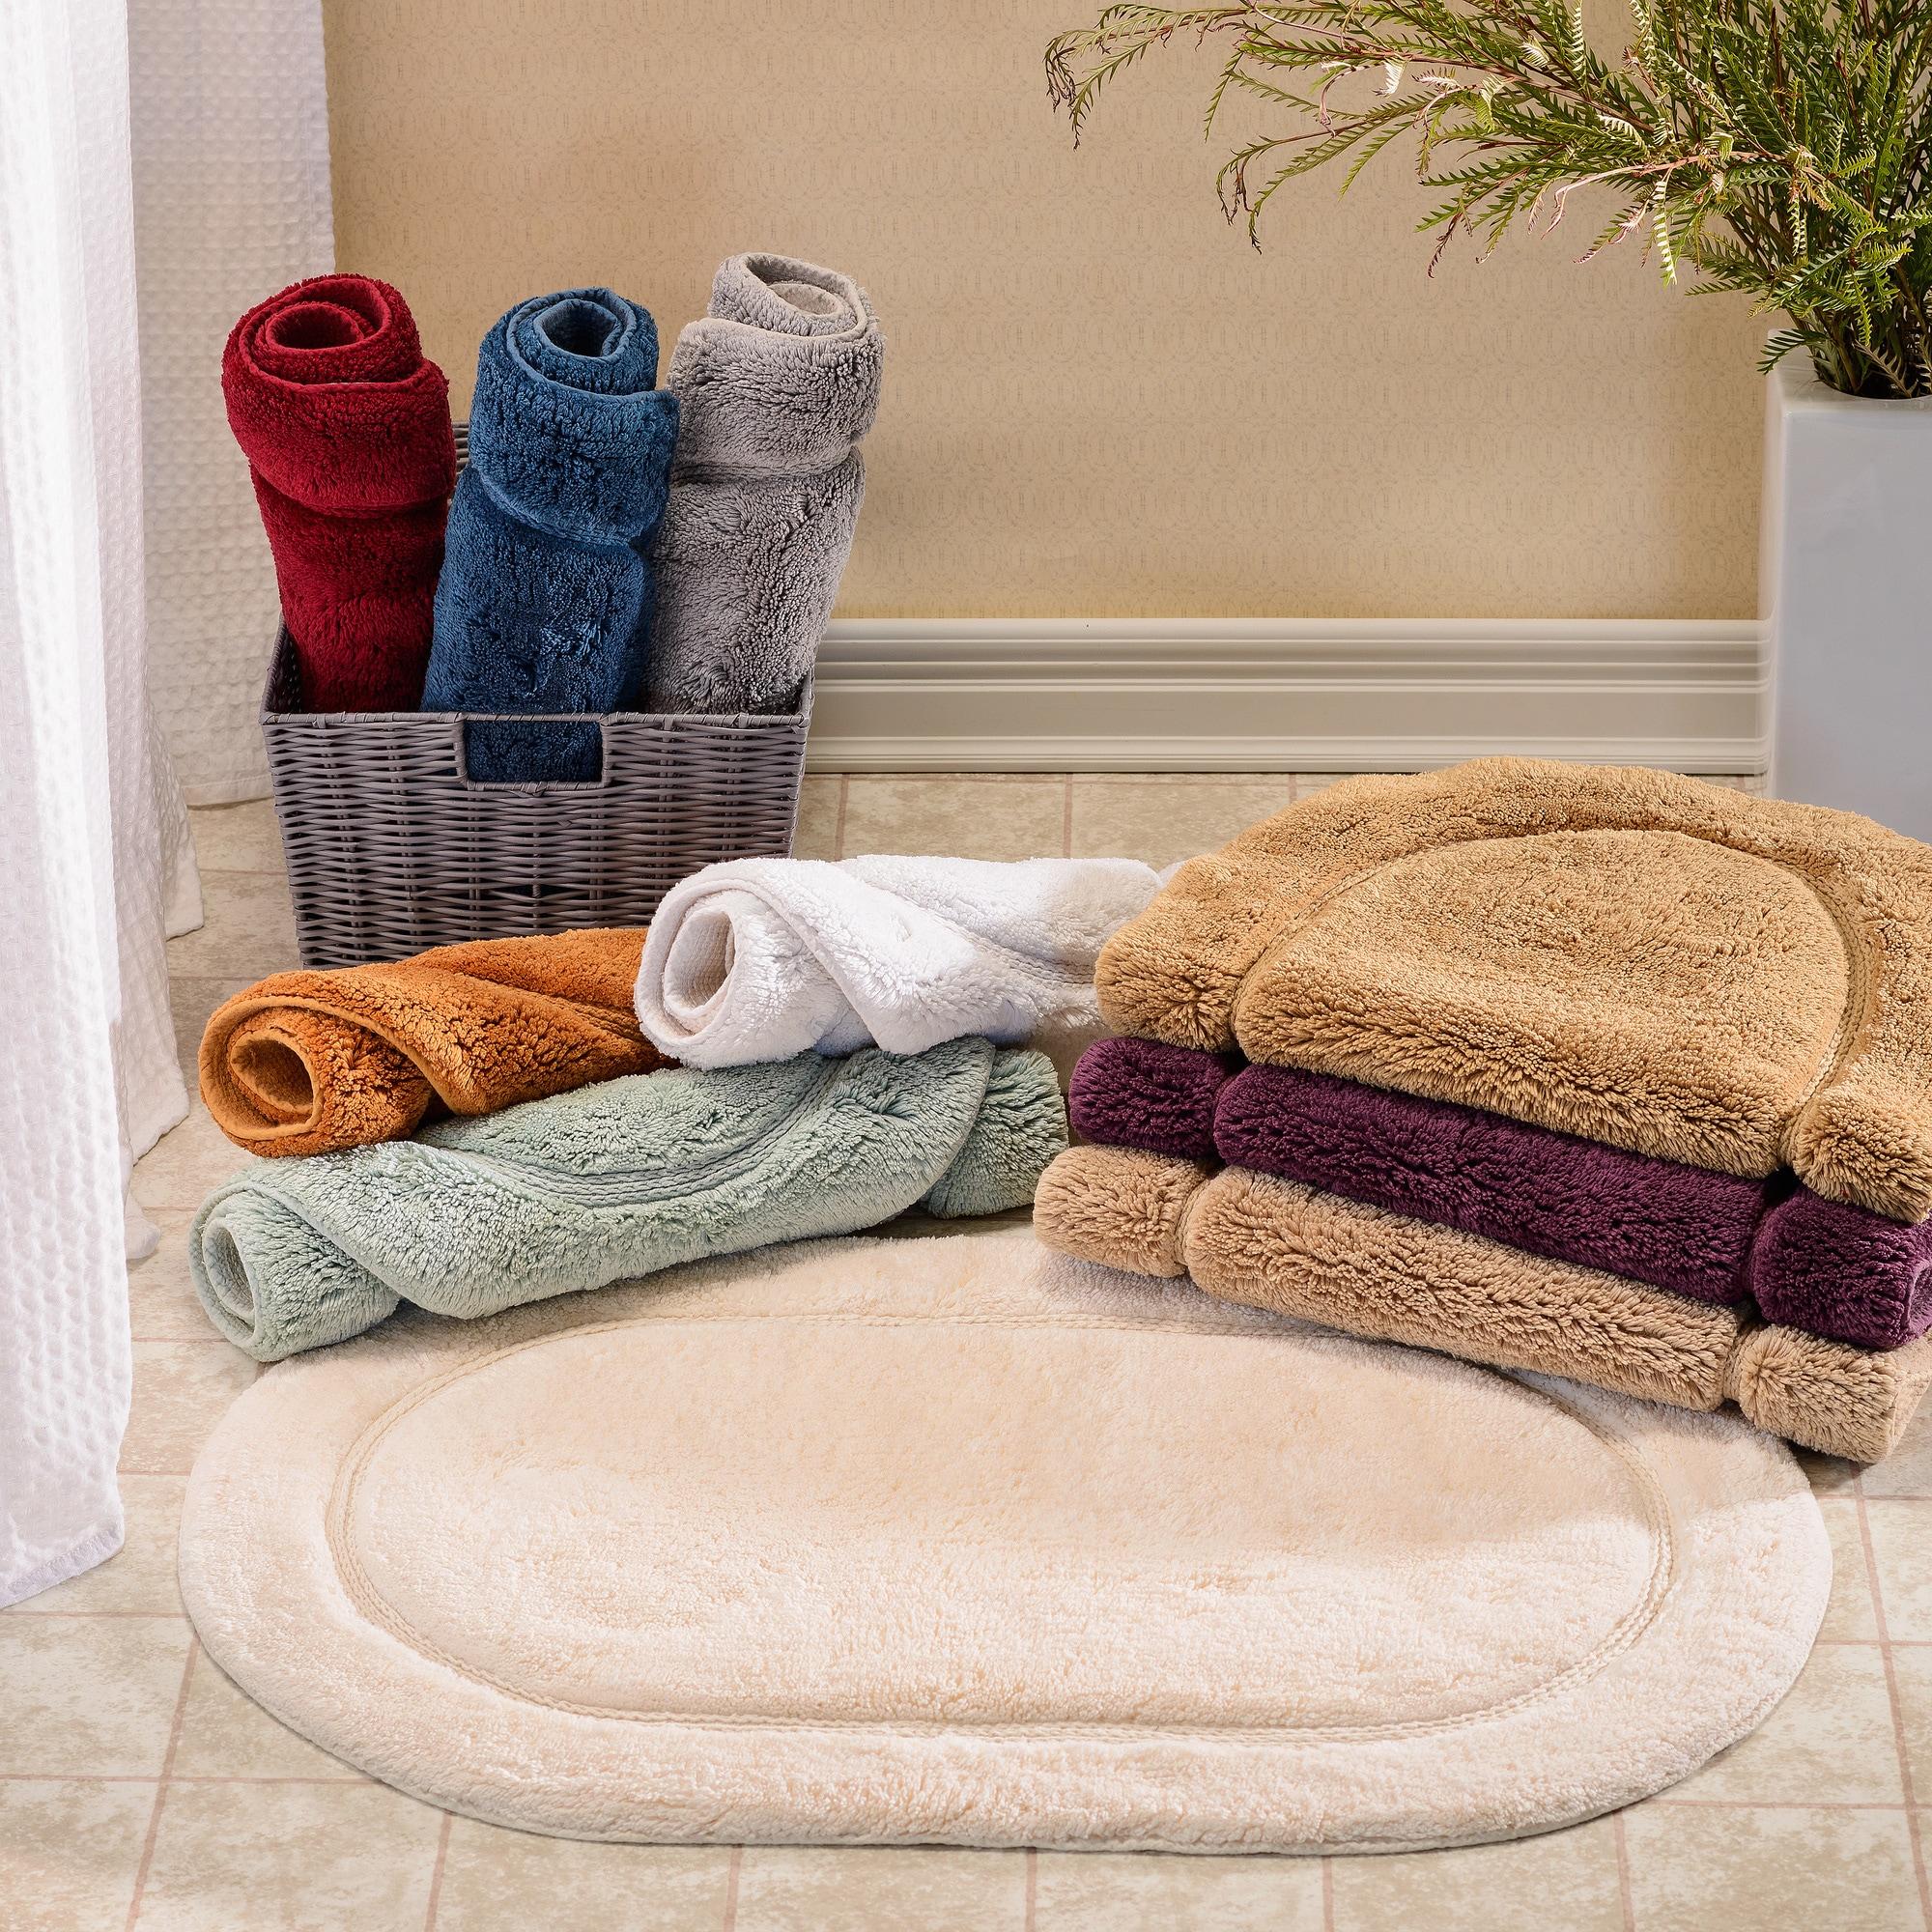 Superior Collection Luxurious Cotton Non-skid Oval Bath